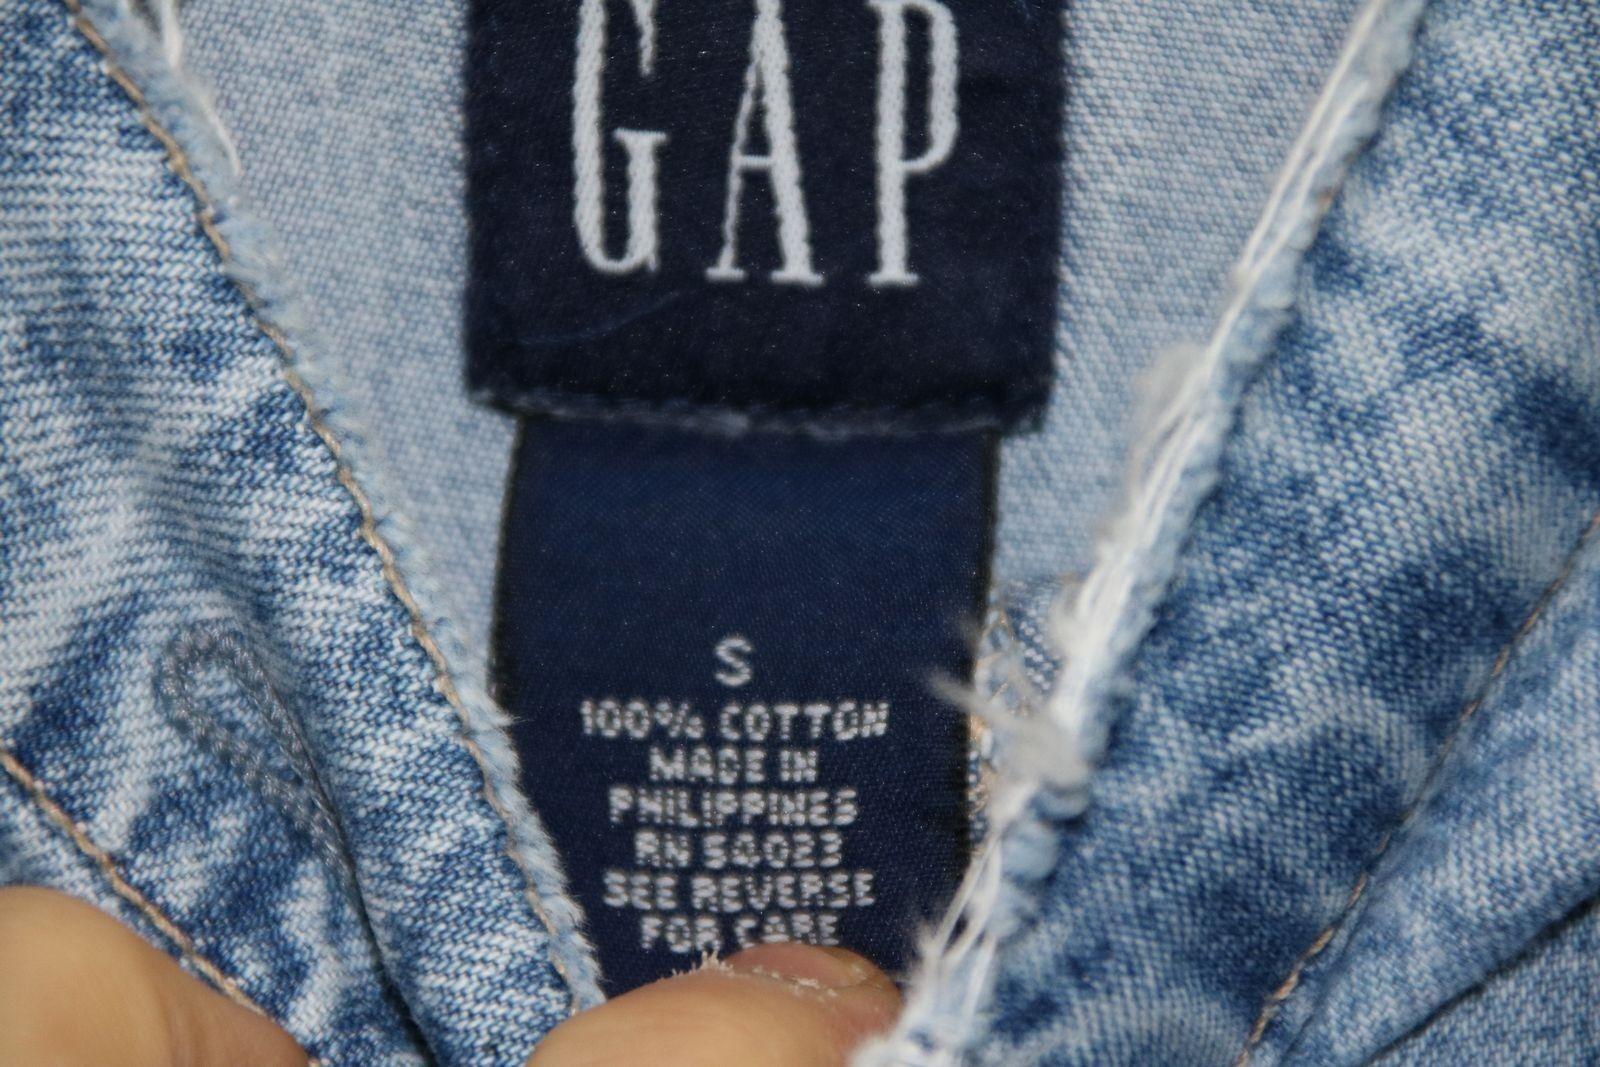 Salopette GAP GAP GAP (Cod. S808) tg S Jeans Usato Vintage custom rotture 9babb5